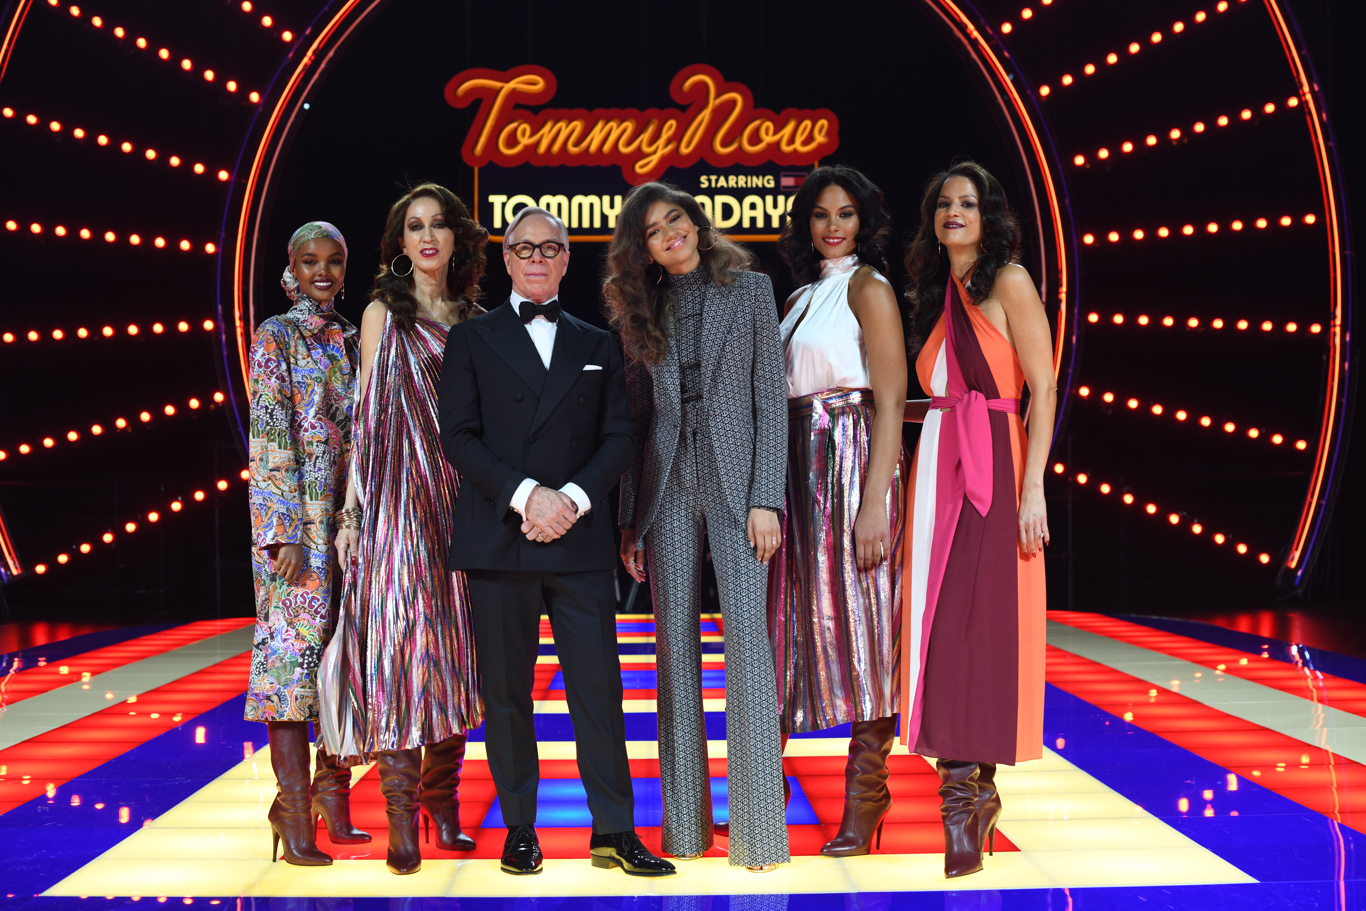 Halima Aden, Pat Cleveland, Tommy Hilfiger, Zendaya Coleman, Marquita Pring and Veronica Webb